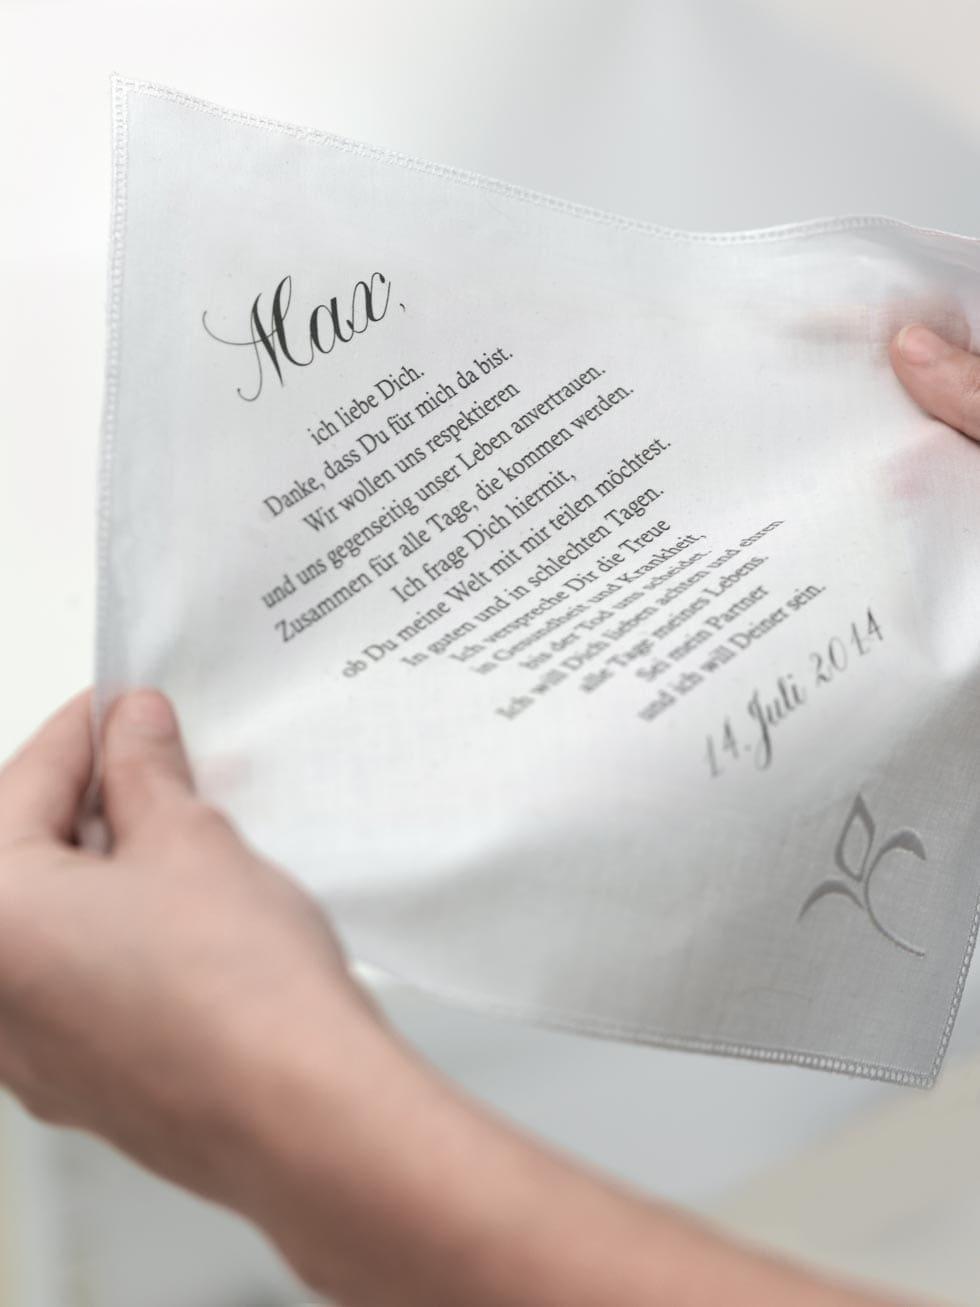 treueversprechen - Ehegelobnis Beispiele